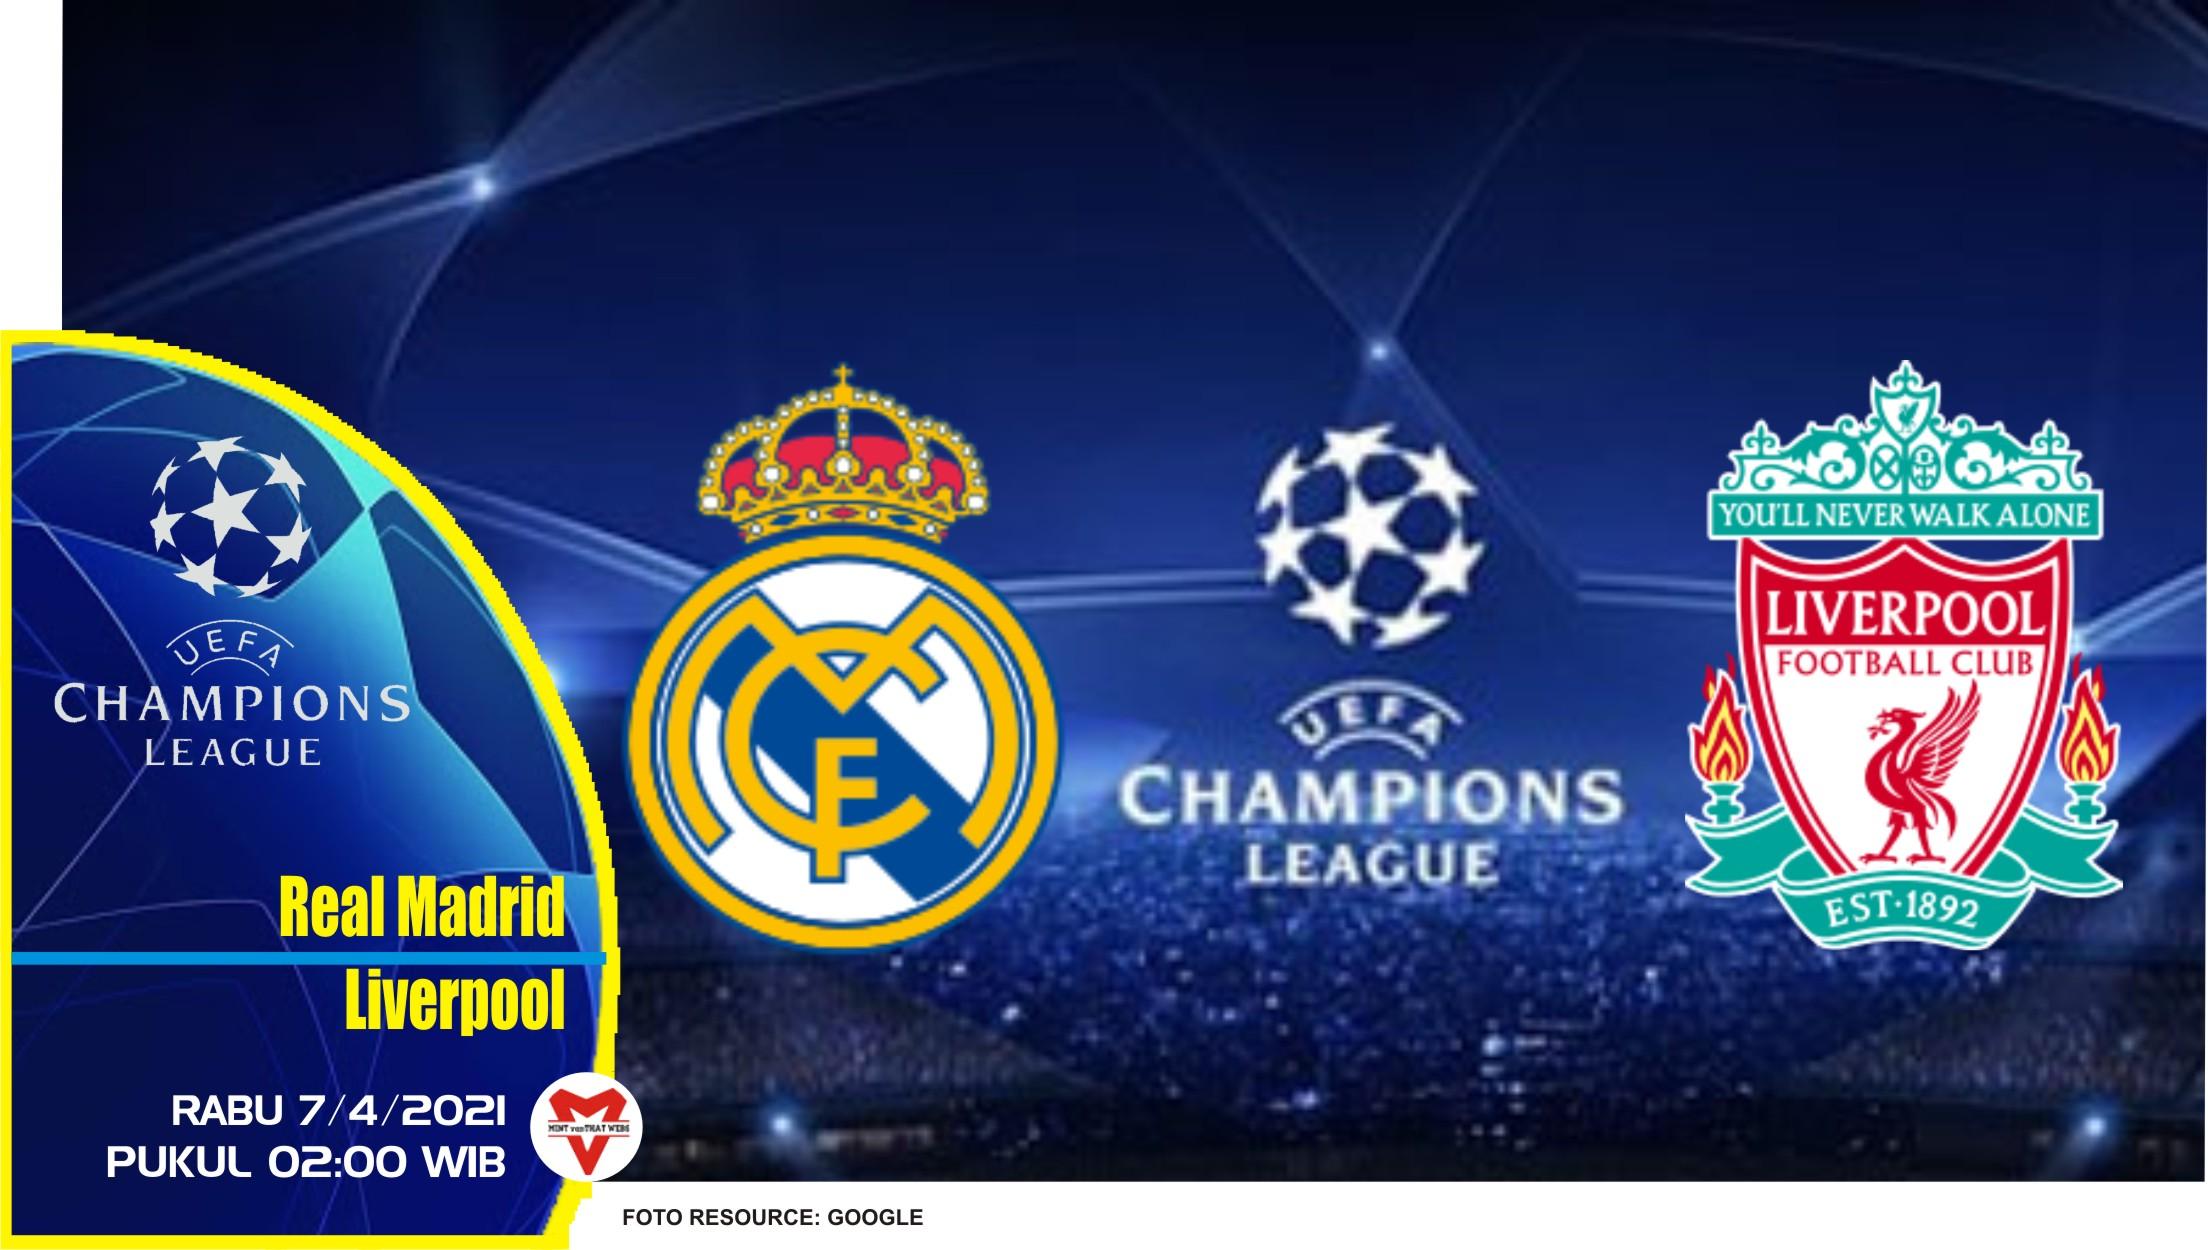 Prediksi Liga Champions: Real Madrid vs Liverpool - 7 April 2021